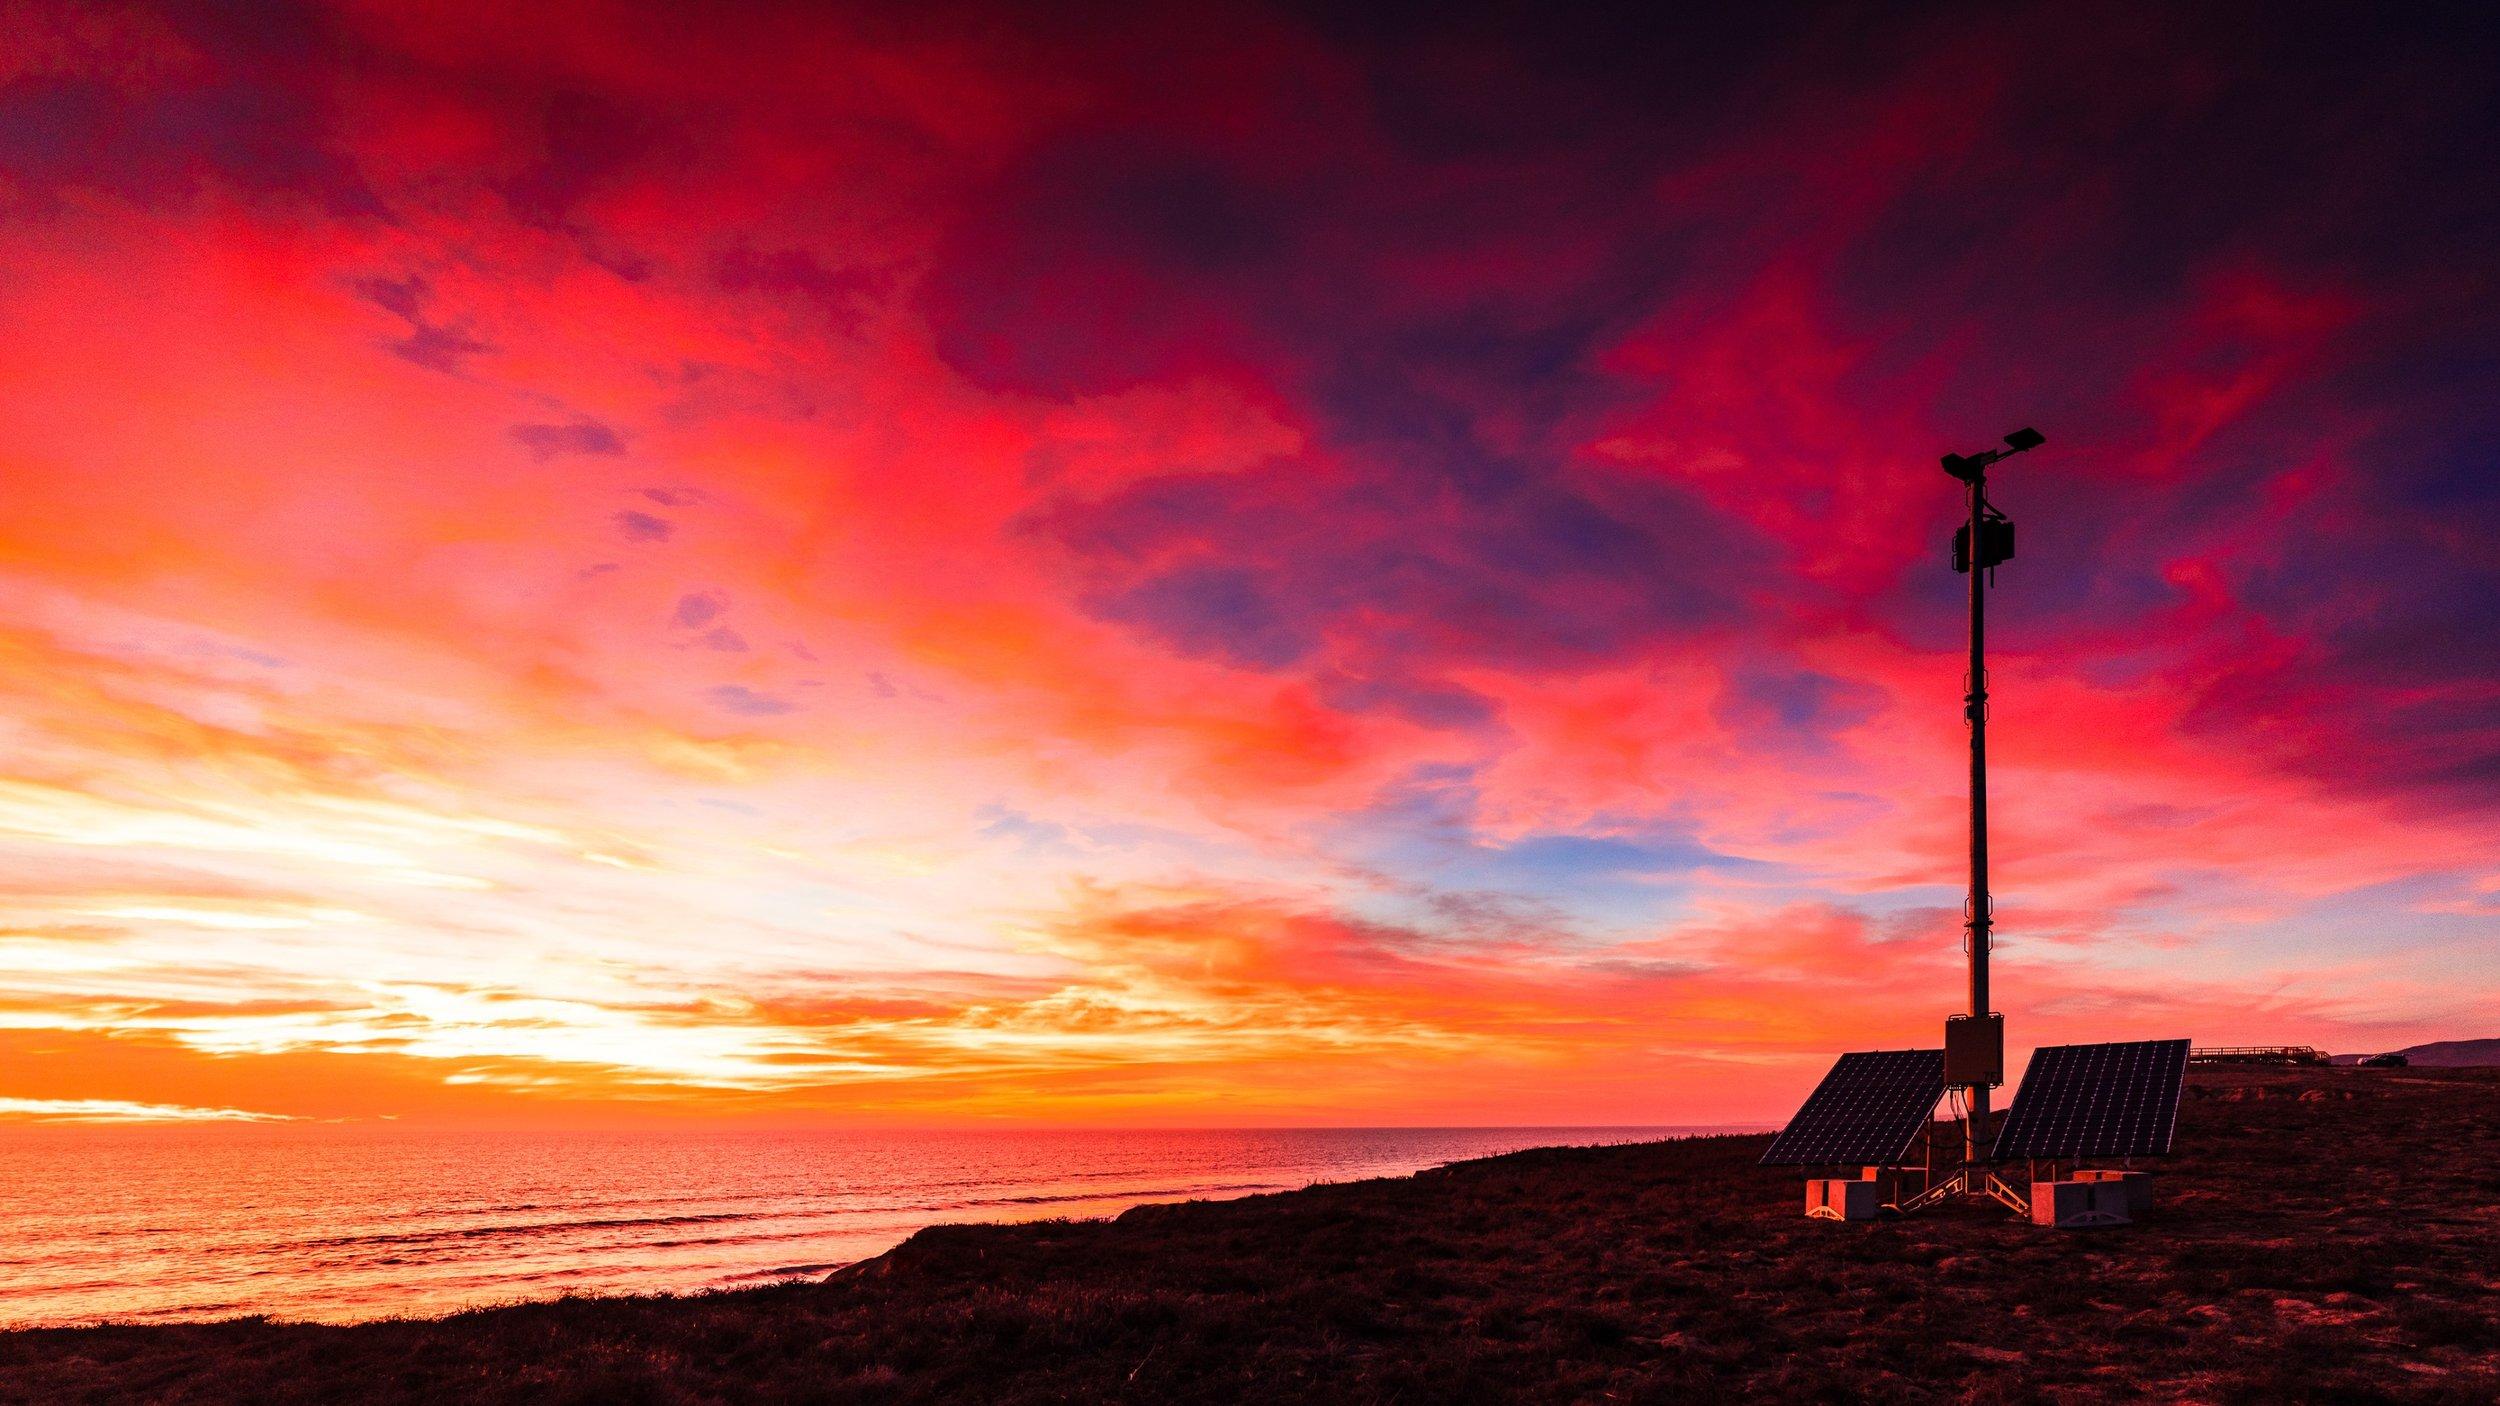 anduril-ai-tower-coast-ocean-24.jpg